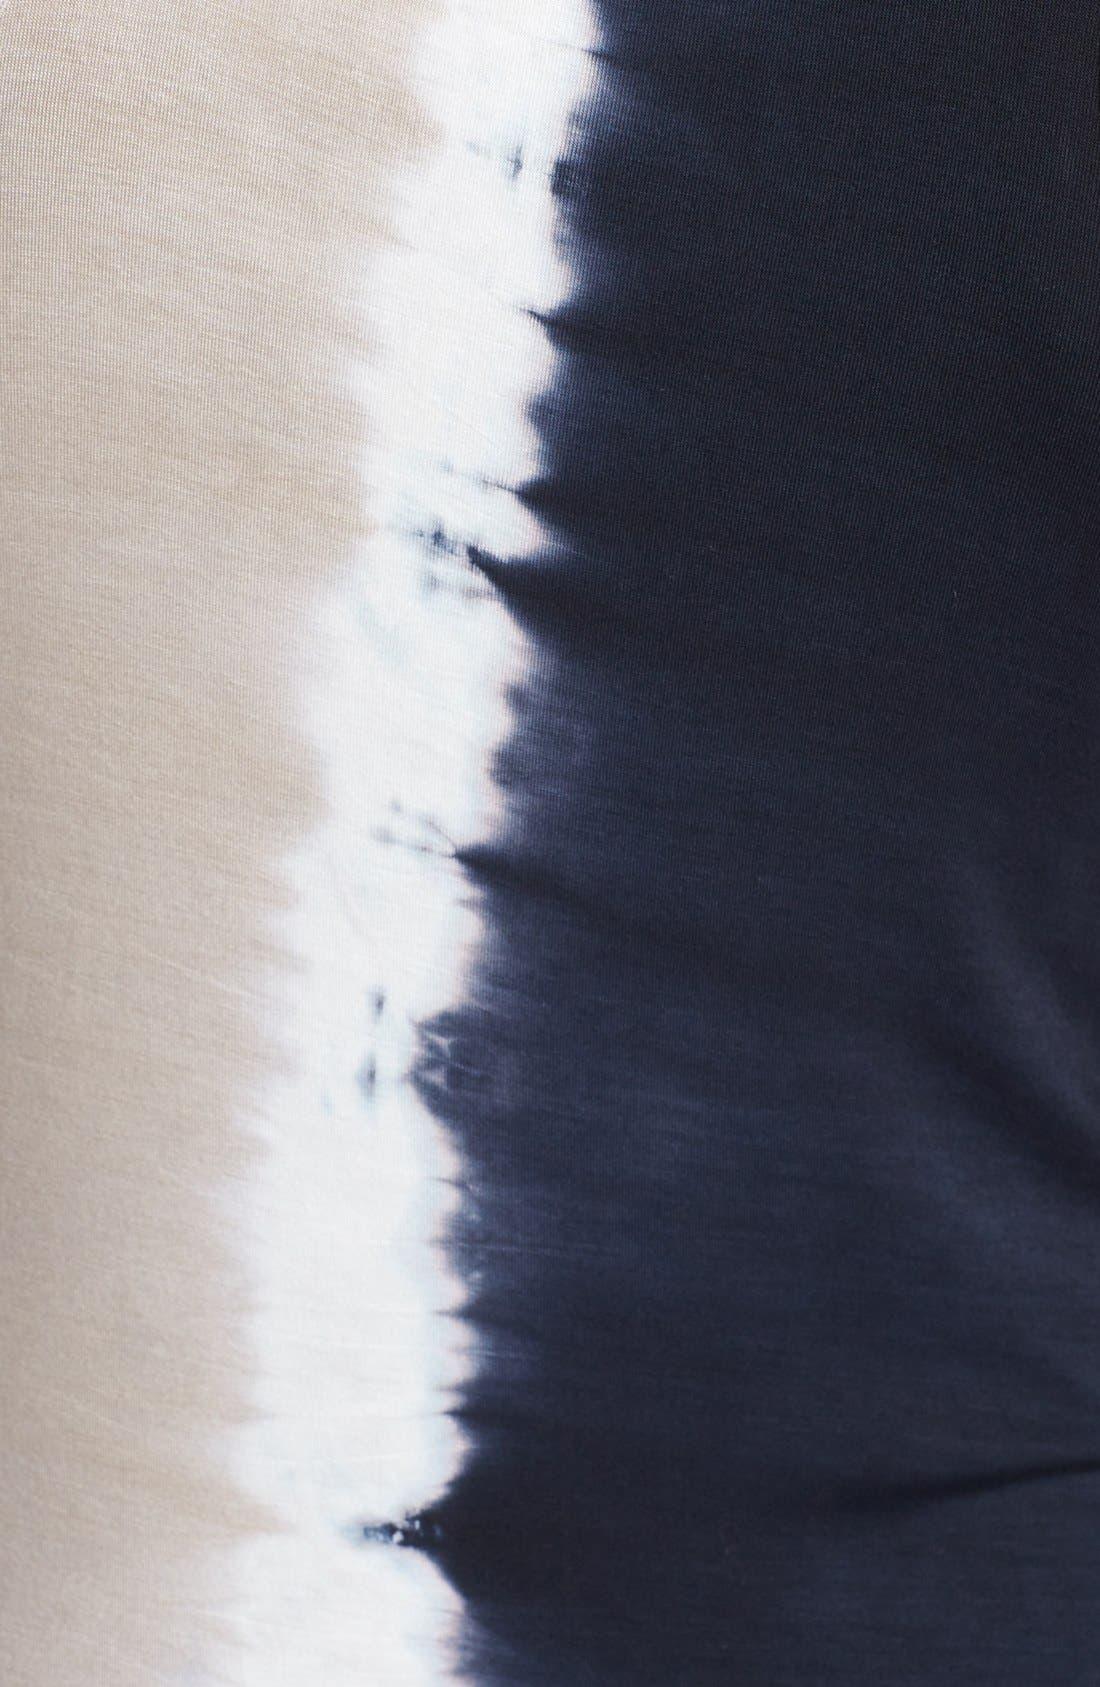 Alternate Image 3  - Felicity & Coco Tie Dye Jersey Maxi Dress (Petite) (Nordstrom Exclusive)